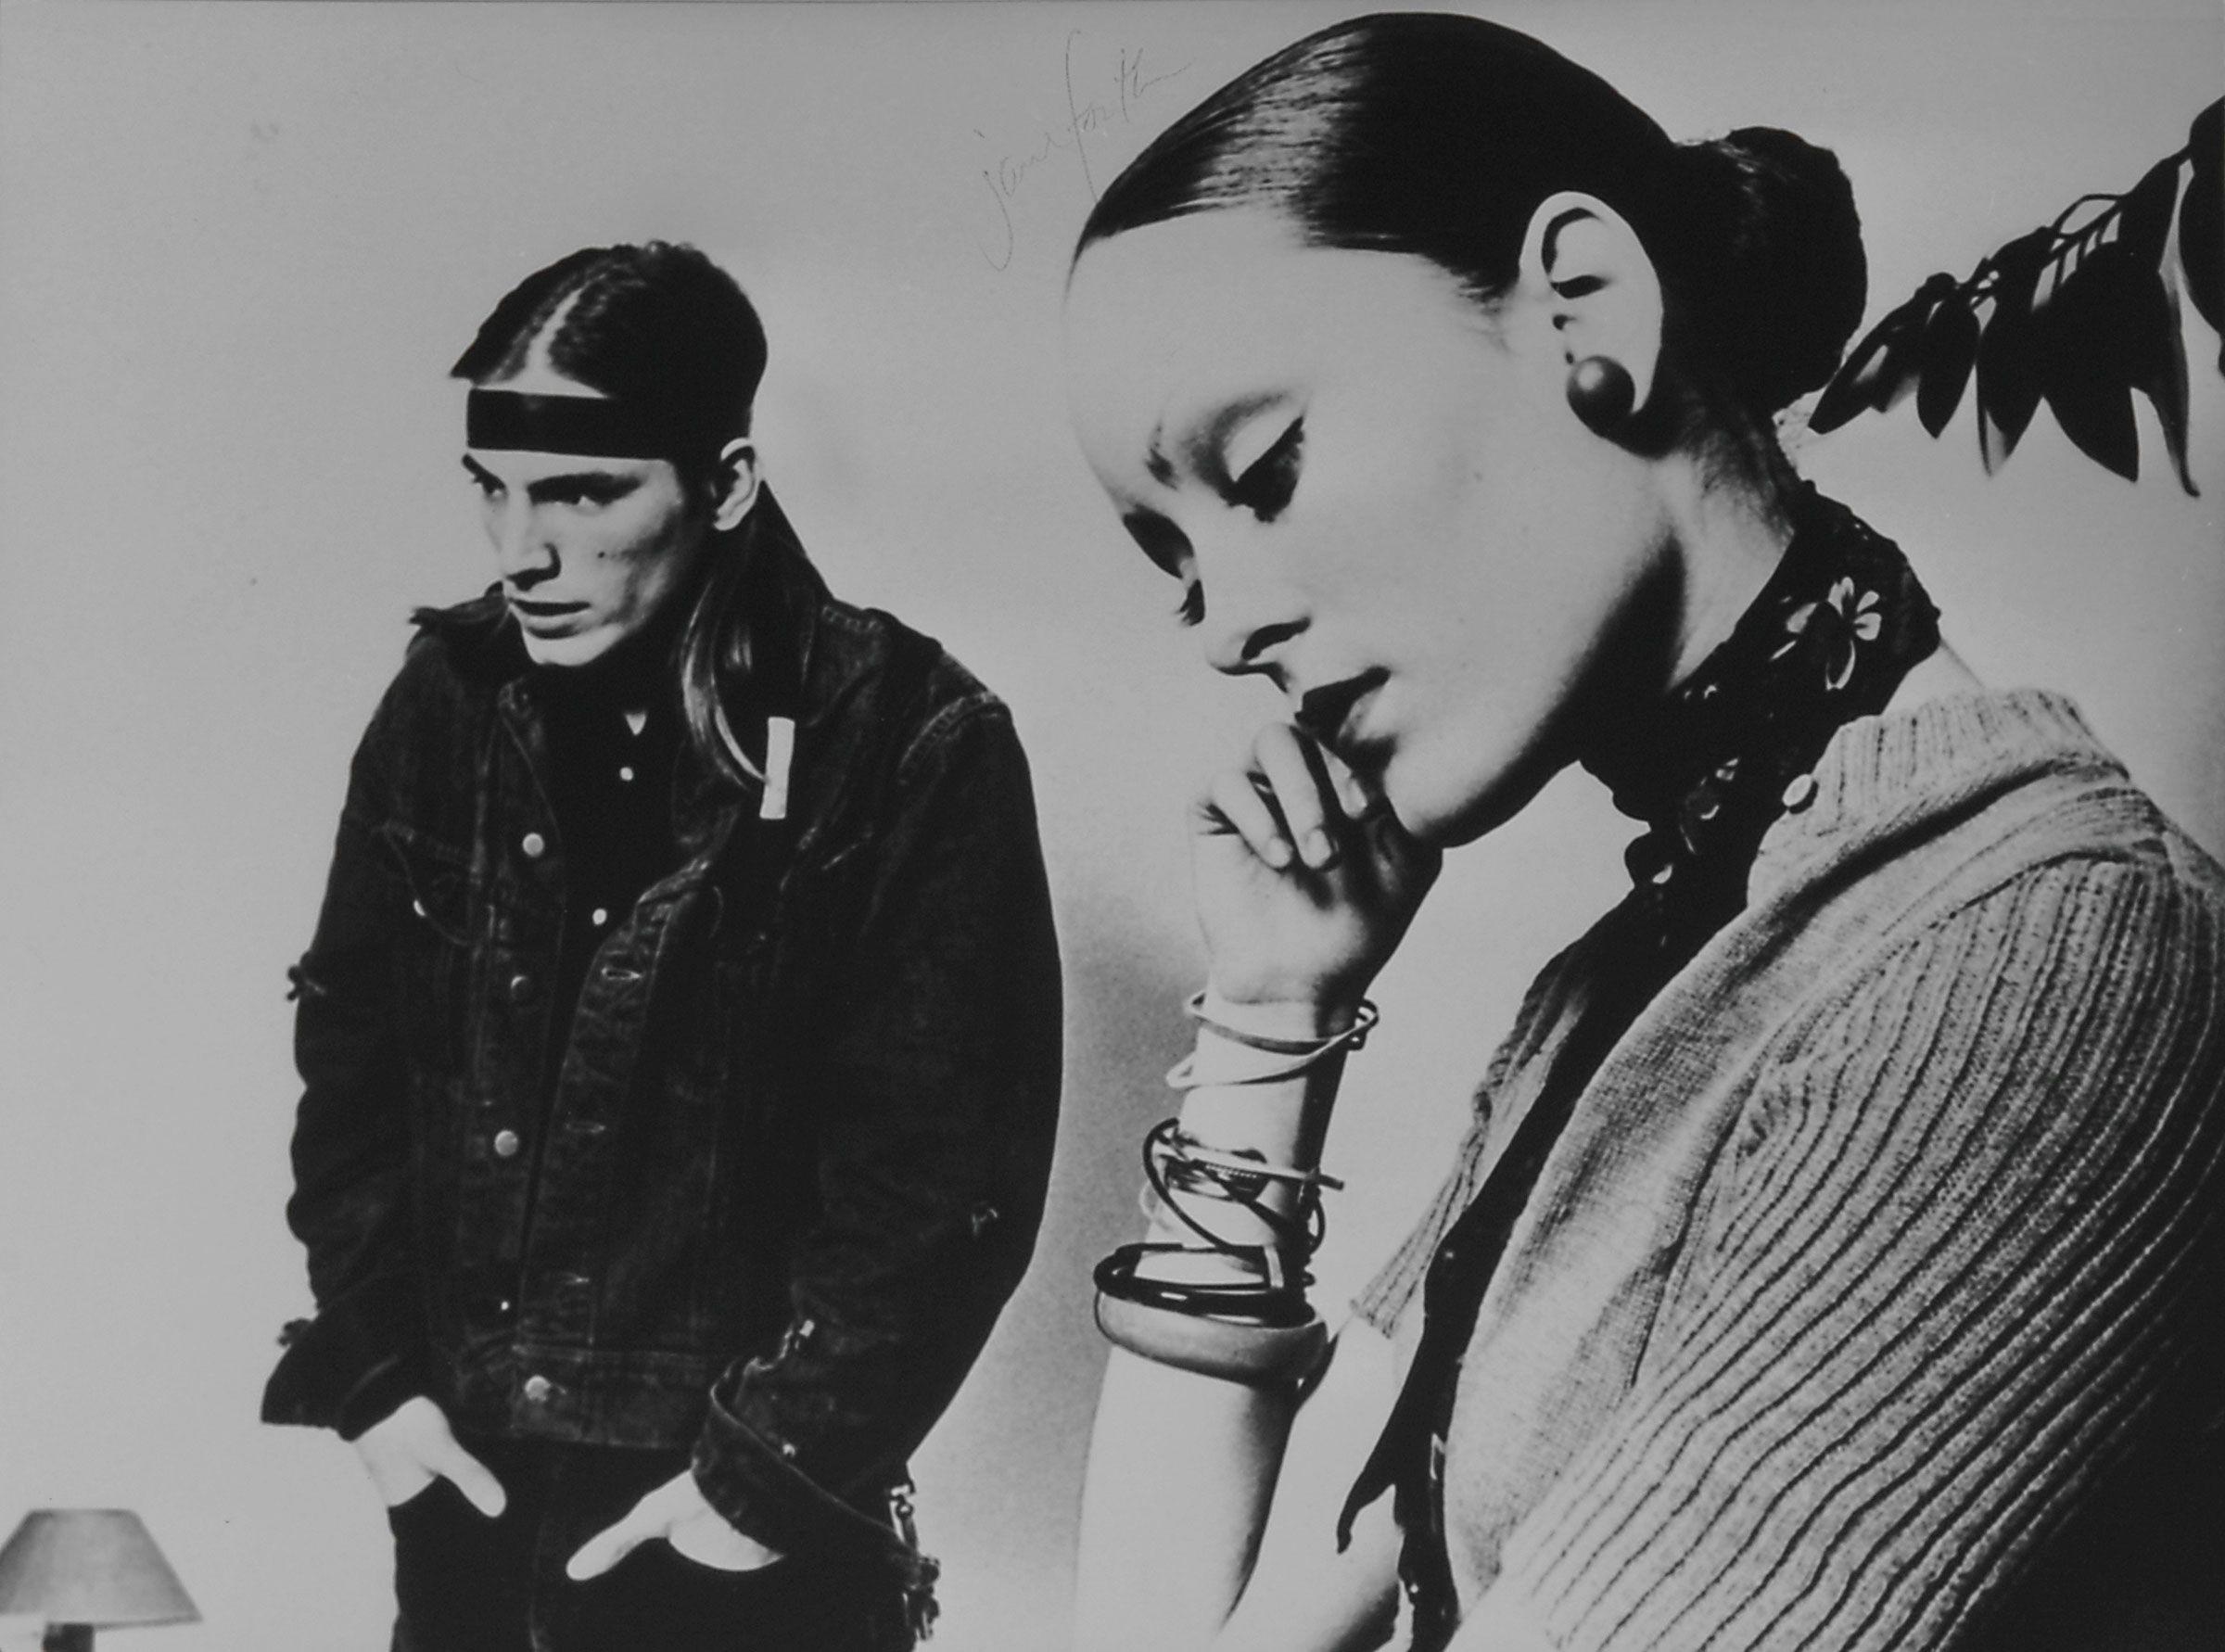 Jane Forth And Joe Dallesandro Trash 1970